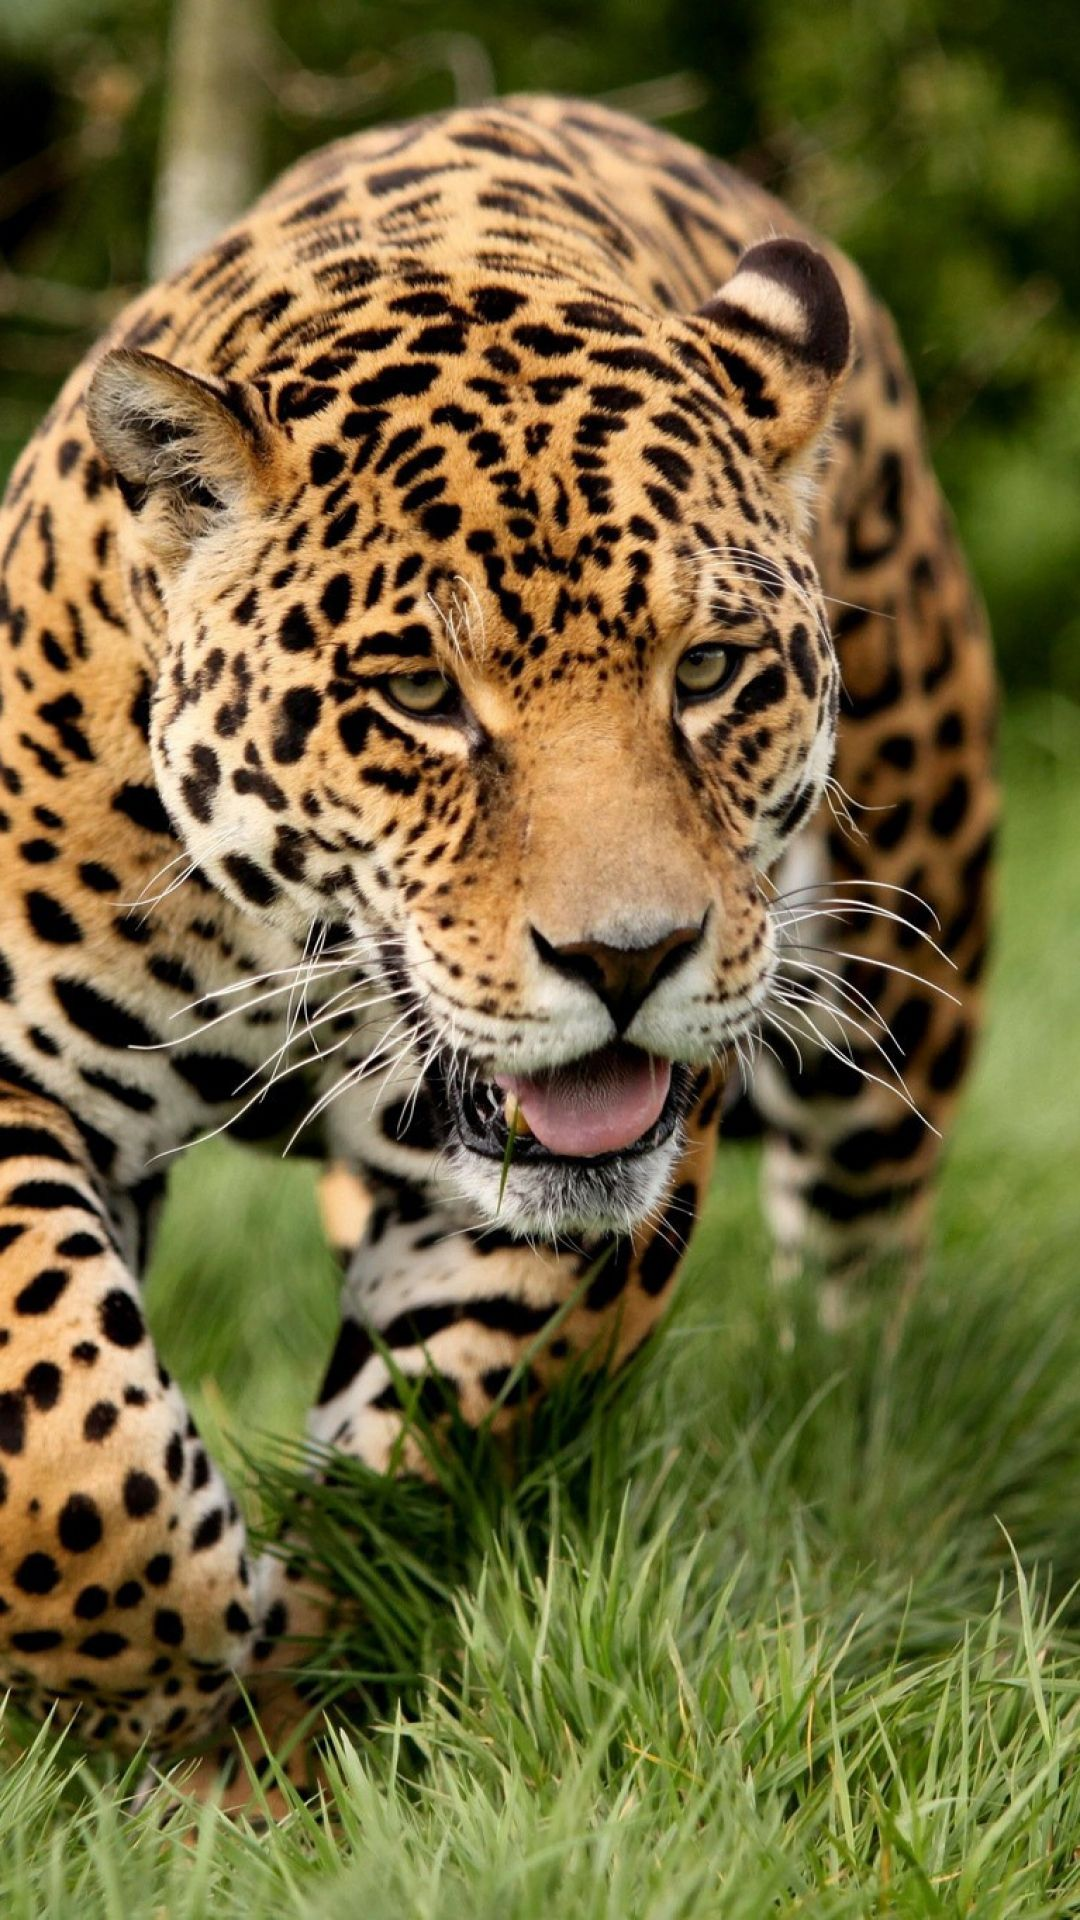 leopard, big cat, predator, escape Wild cats, Animals